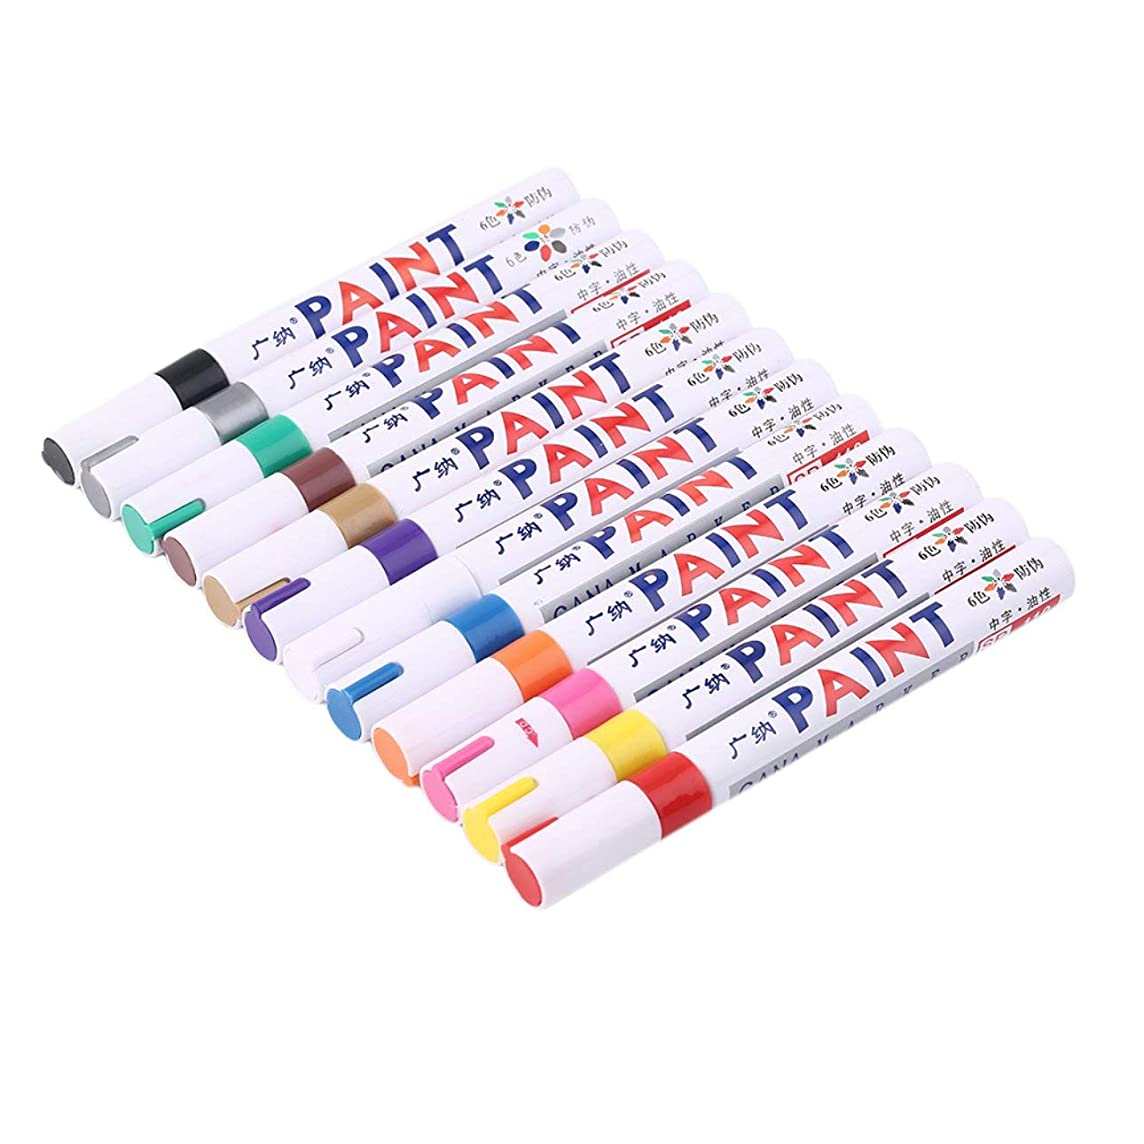 Smartlove1P Indelible Marker Pen Oil Fill Paint Pen Graffiti Multifunctional Tire Pen